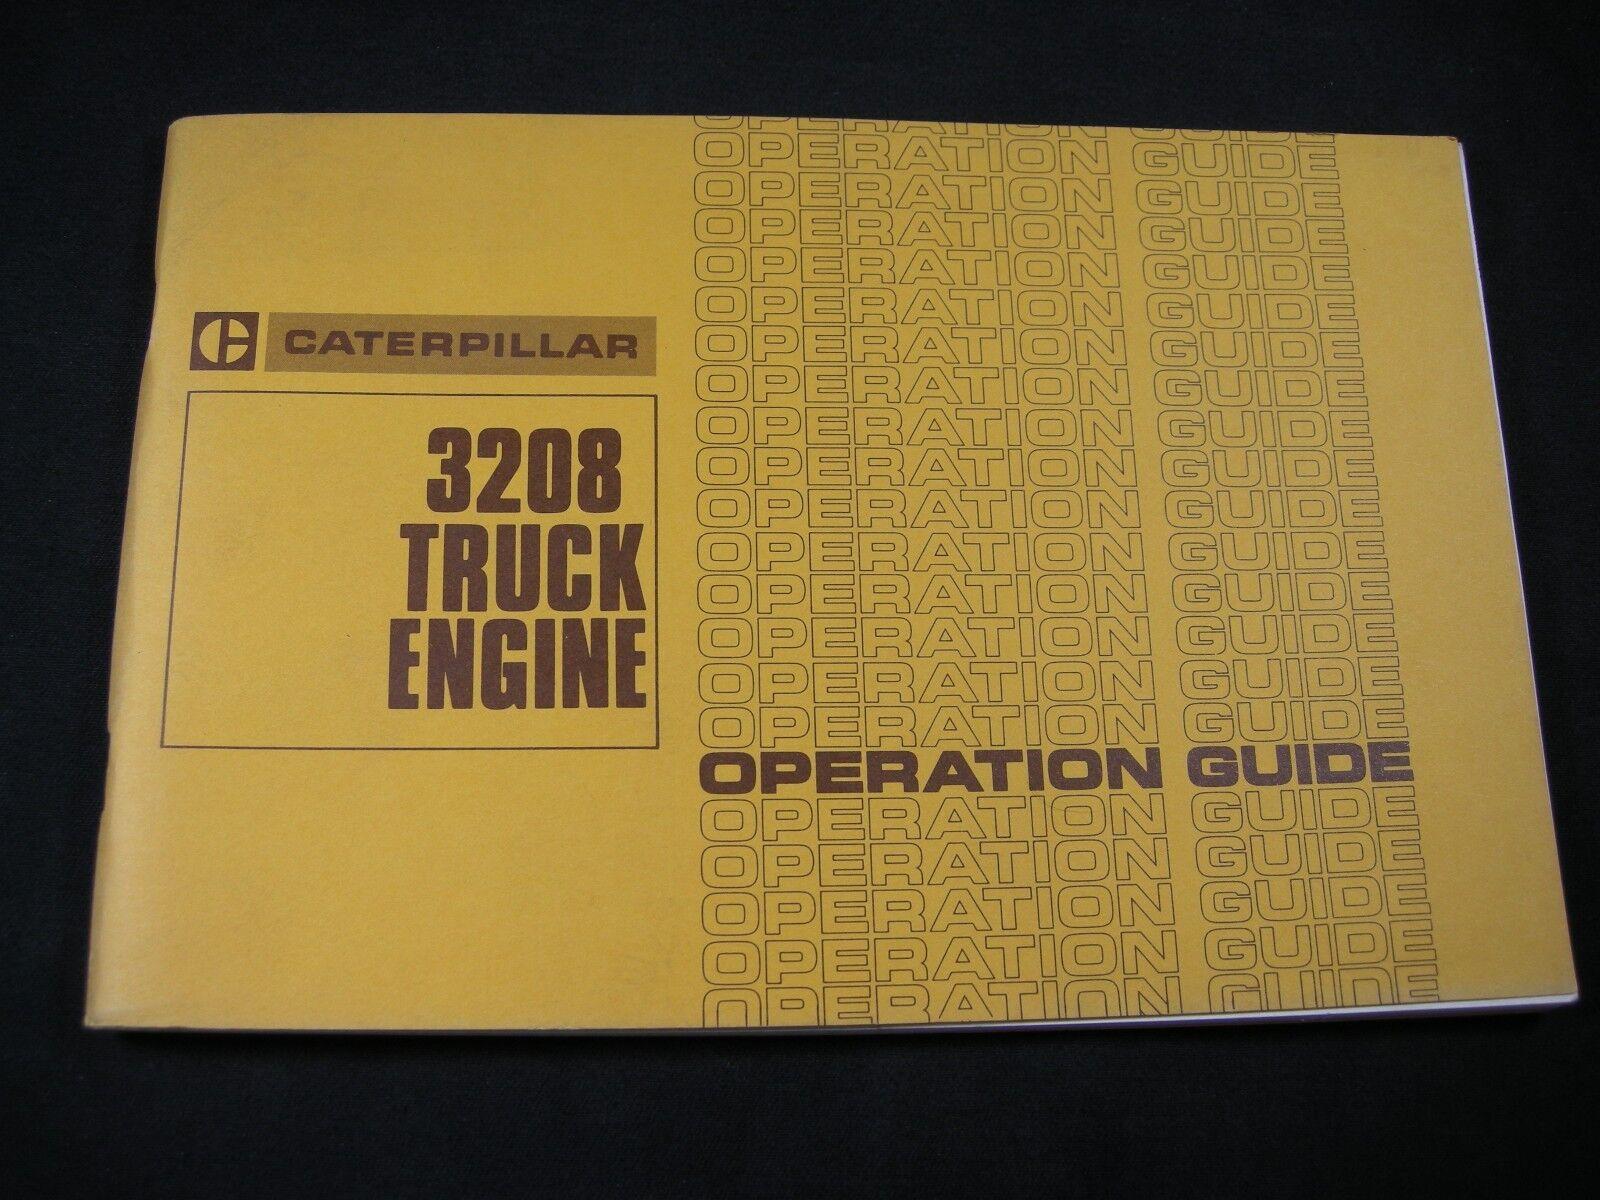 CAT Caterpillar 3208 Operation Maintenance Manual Diesel Truck Engine Guide  Book | eBay